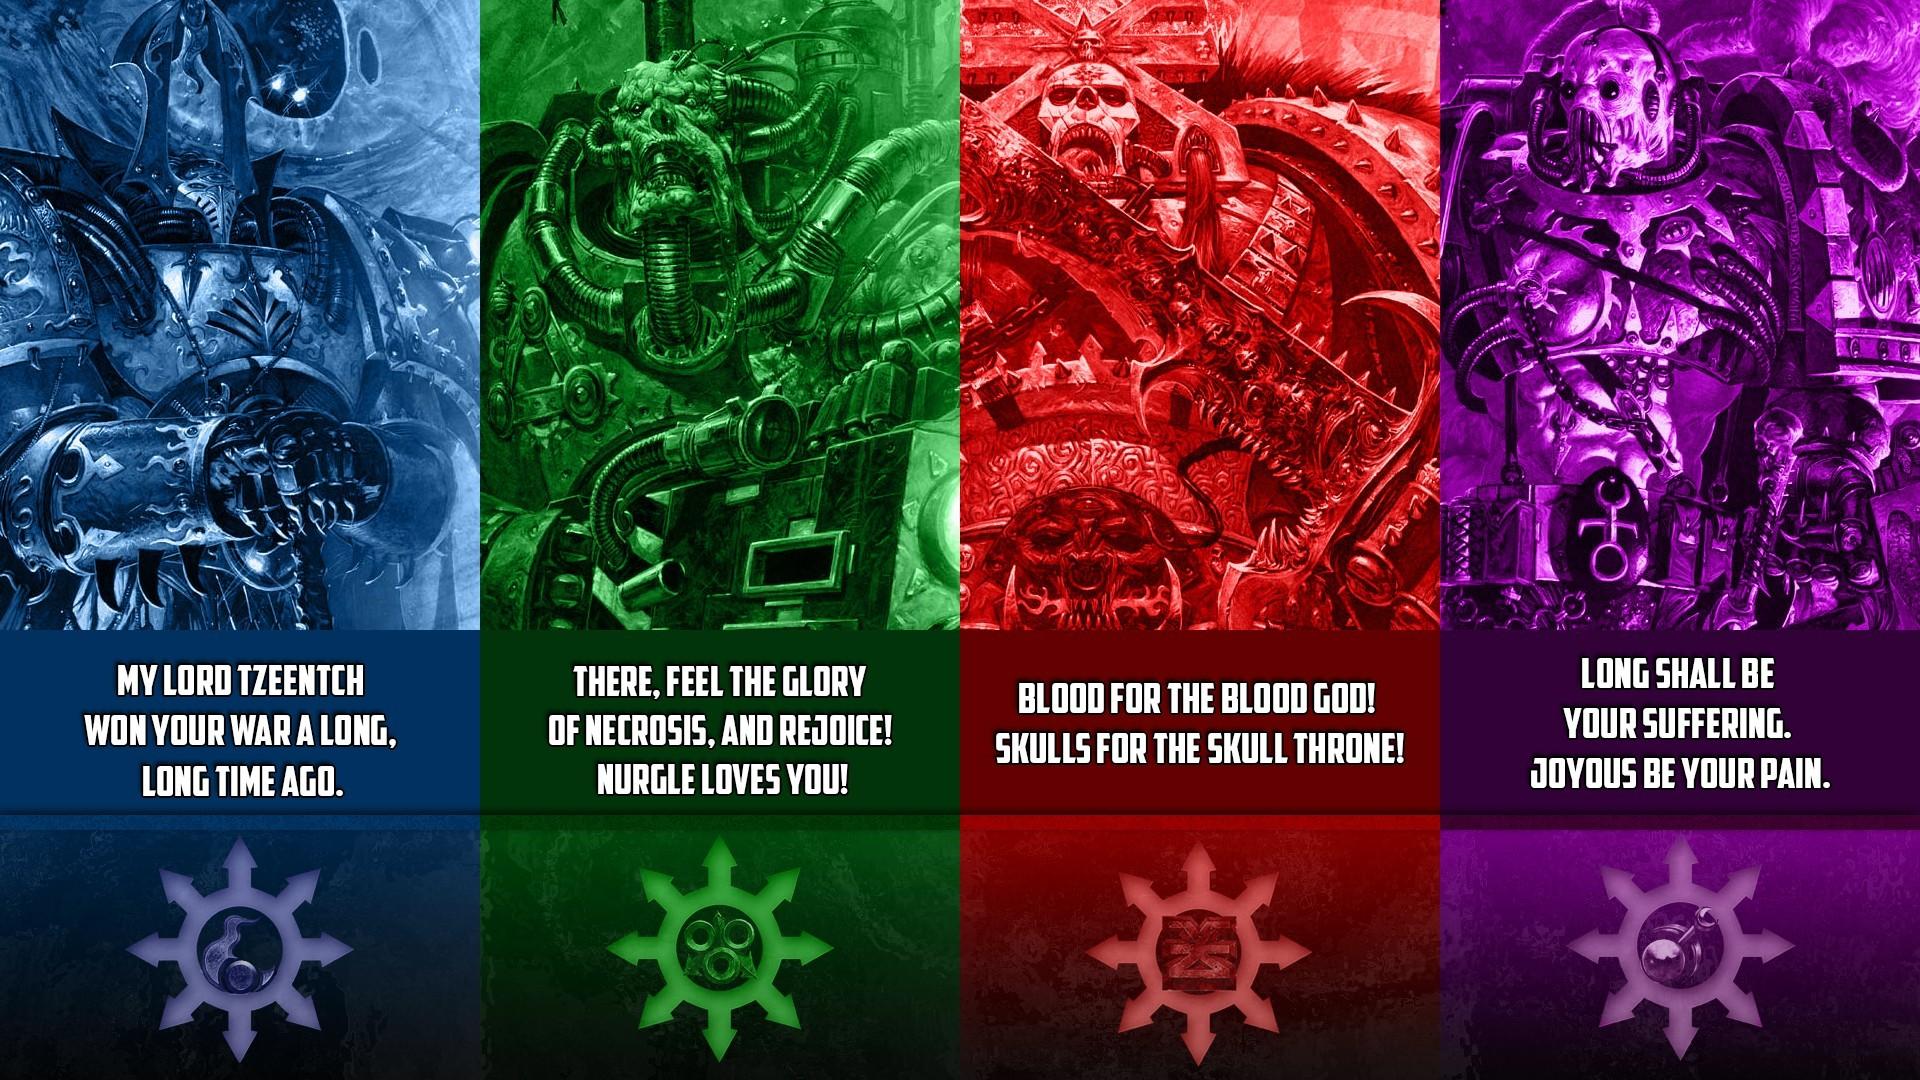 General video games warrior Warhammer 40,000 Chaos factions